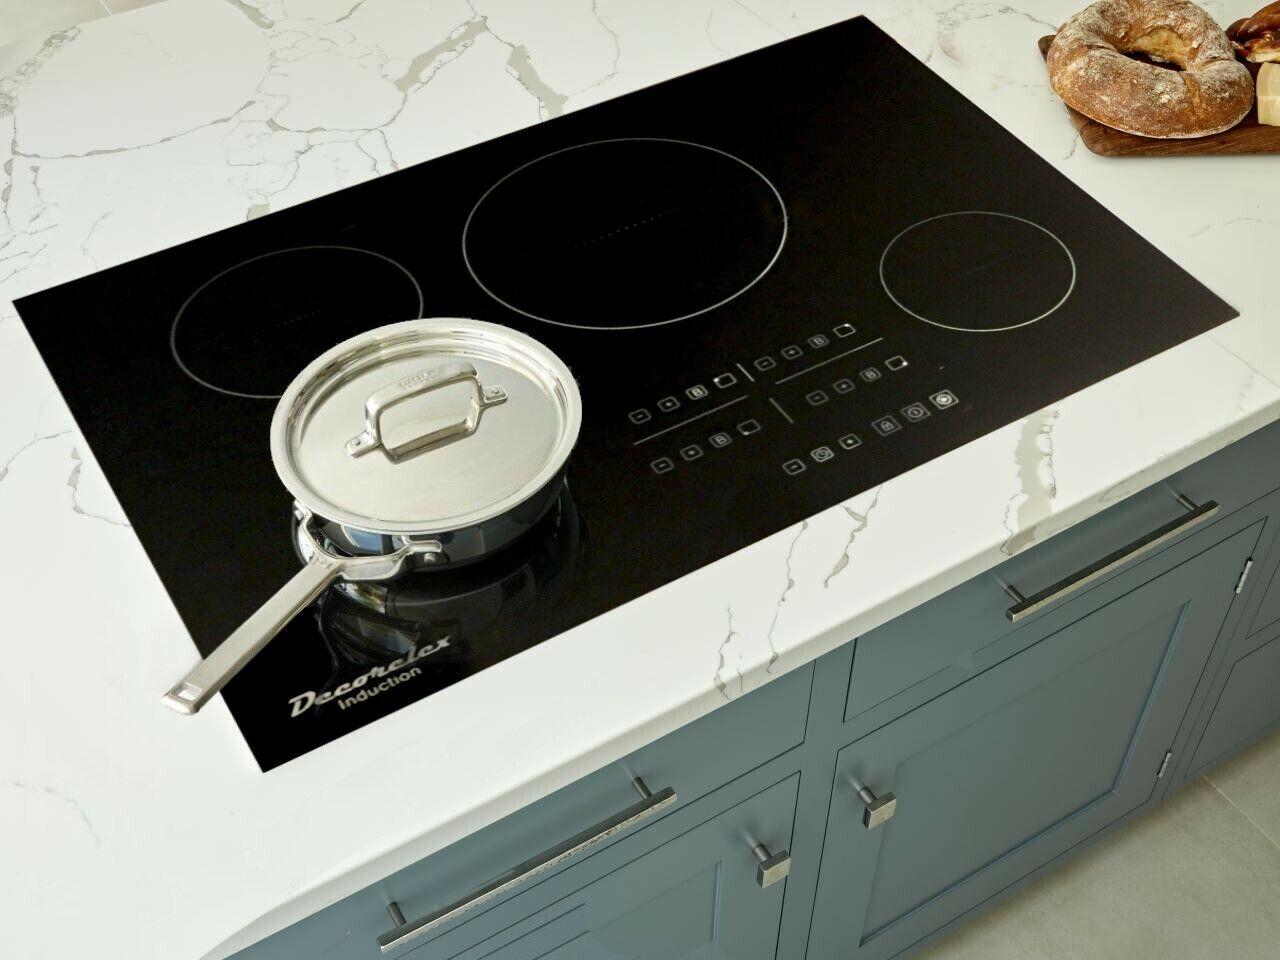 "Decorelex 30"" Built-In 4 burner Induction Cooktop"